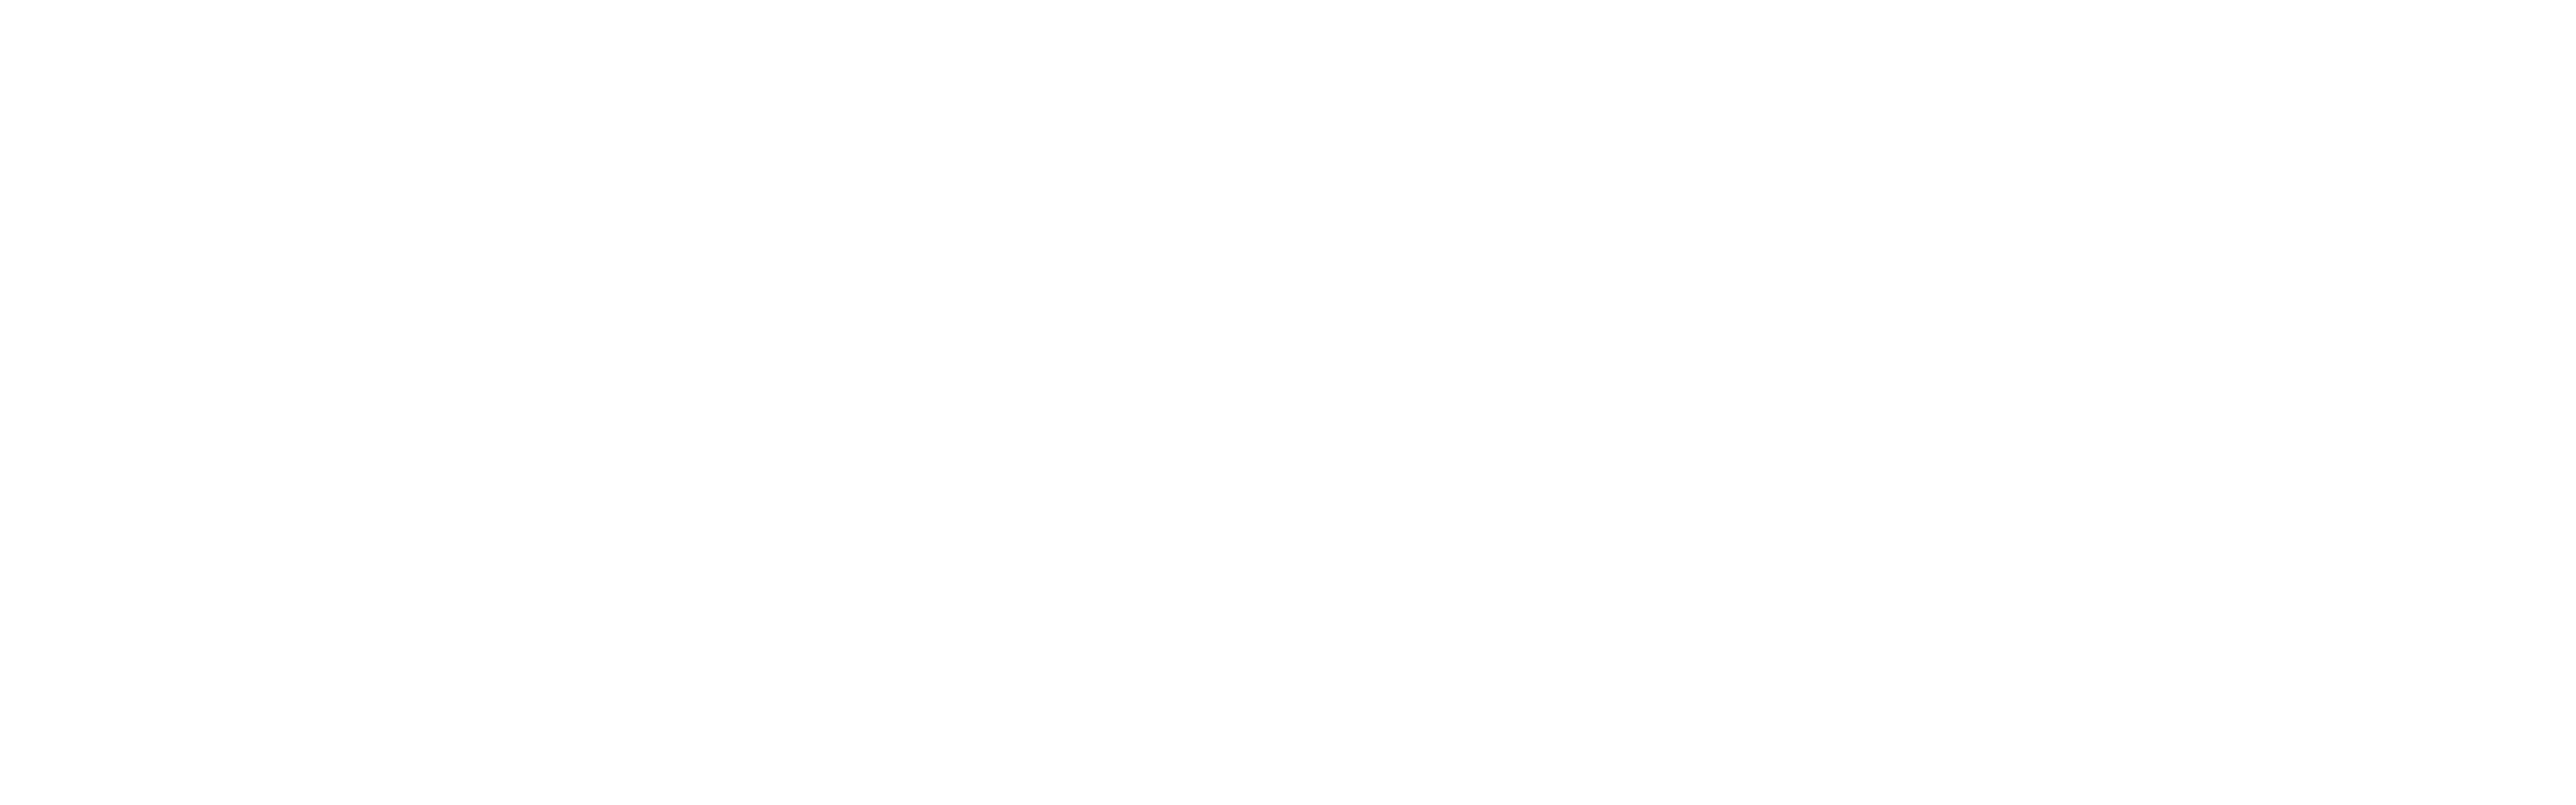 vcti horizontal logo 1 white transparent  azo font